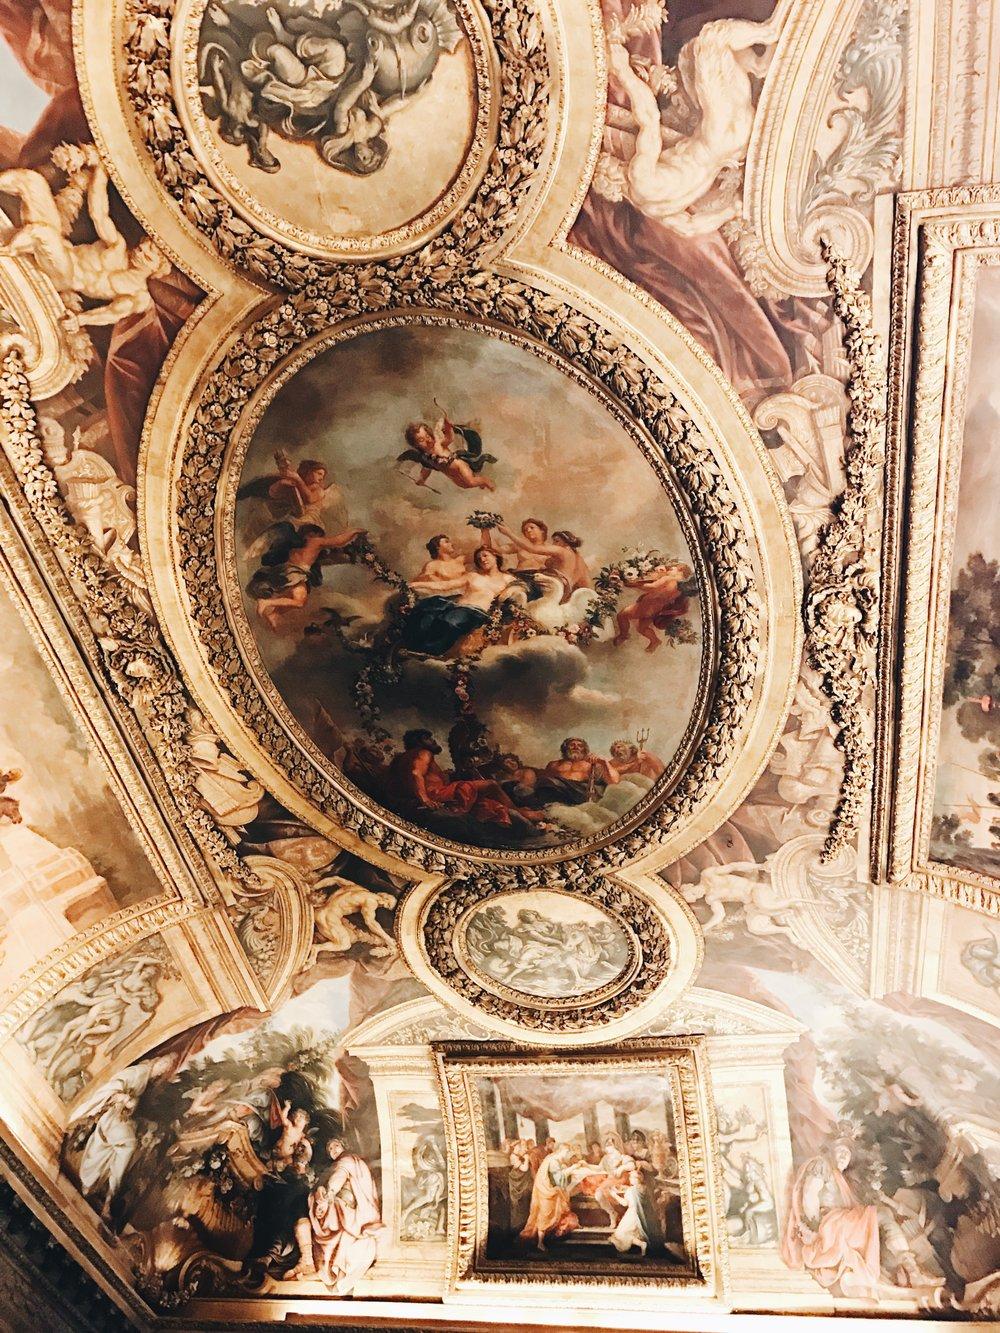 Hall of Mirrors, Versailles Palace